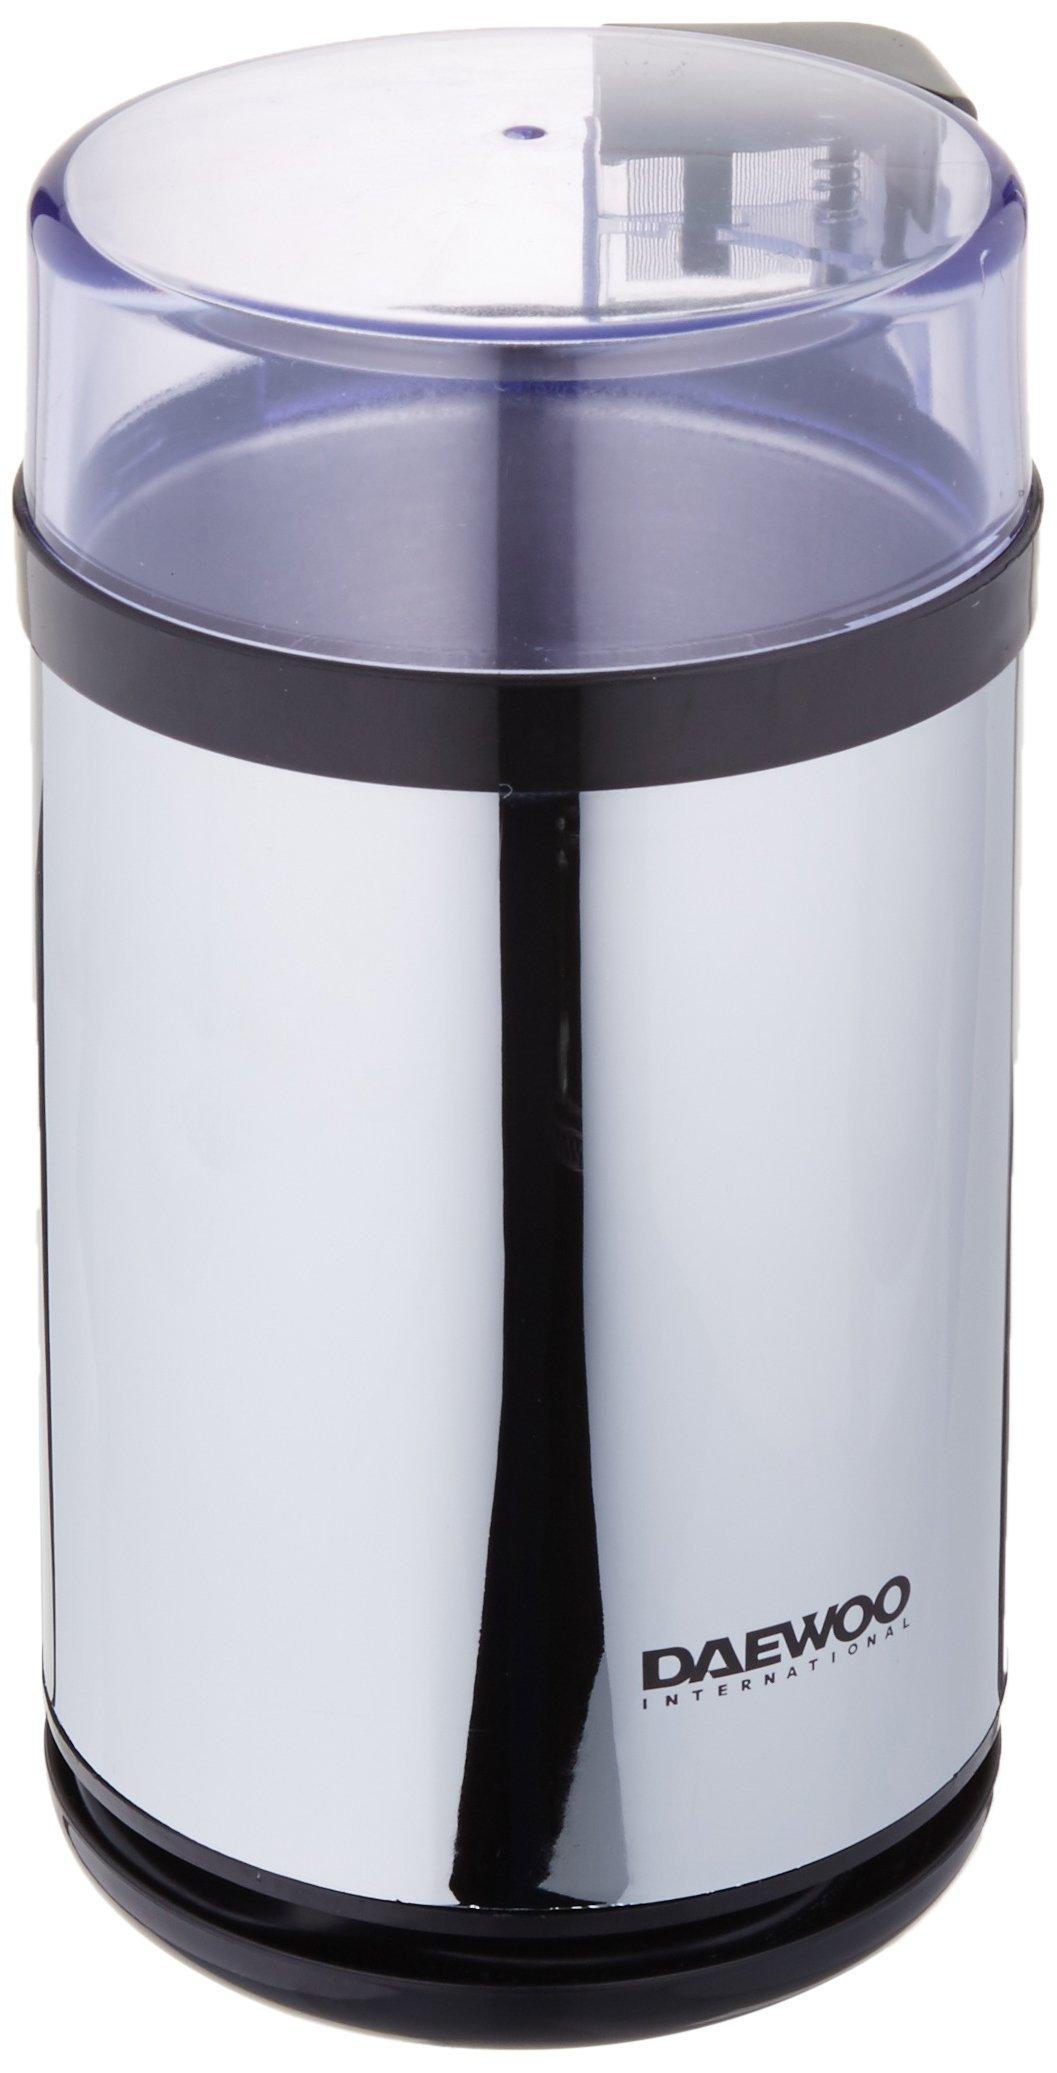 Daewoo DI-9365 180-watt 85gm Capacity Coffee Grinder, 220 to 240 Volts by Daewoo